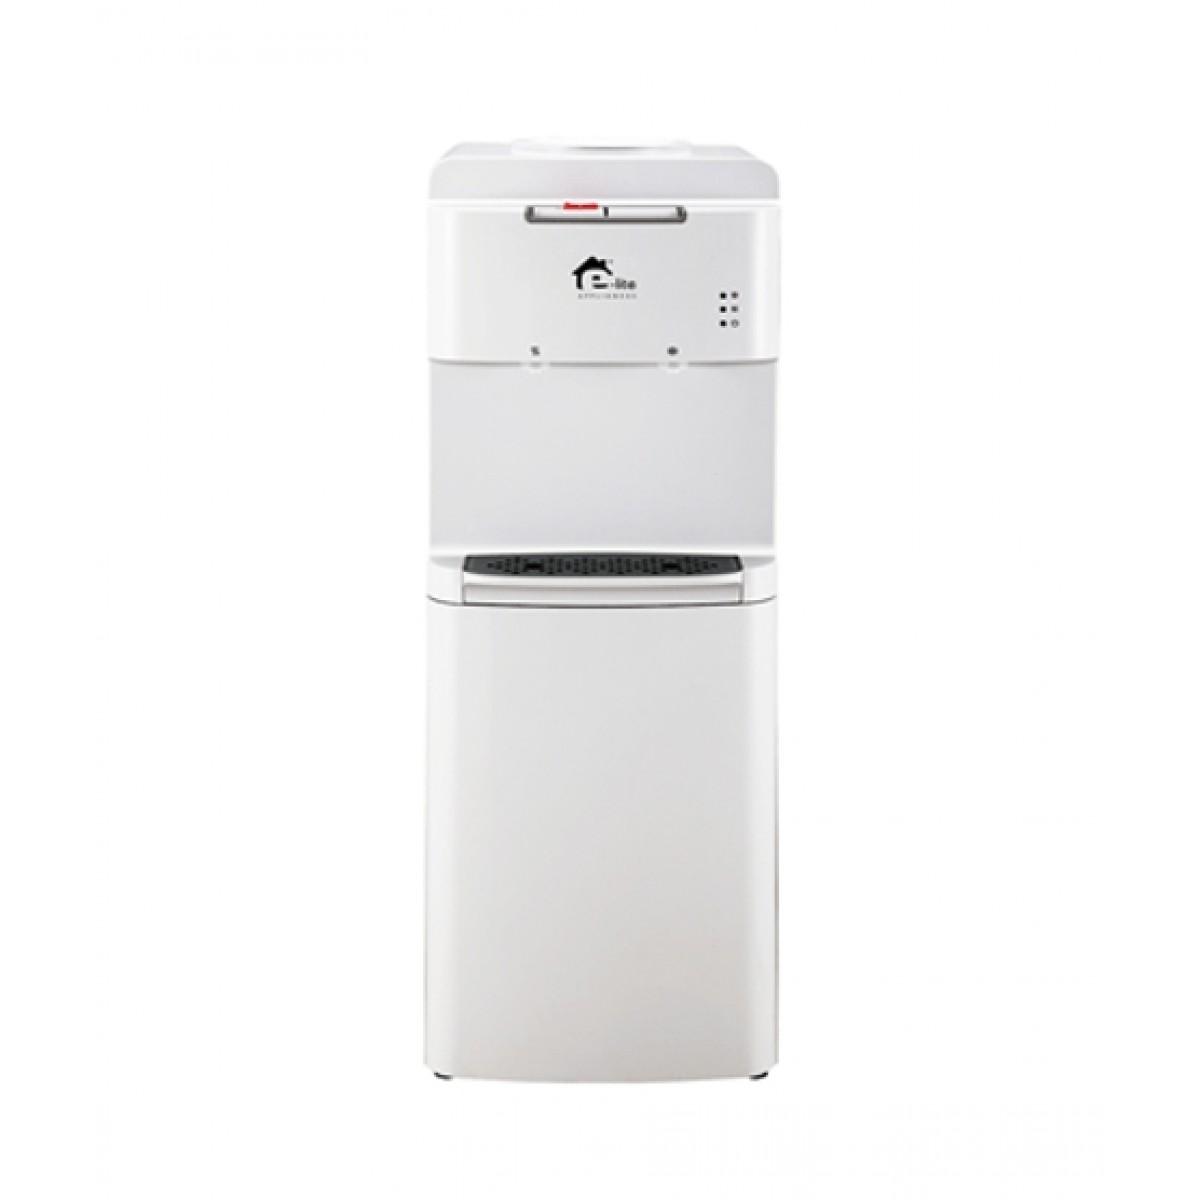 E-Lite Water Dispenser White (EWD-15)